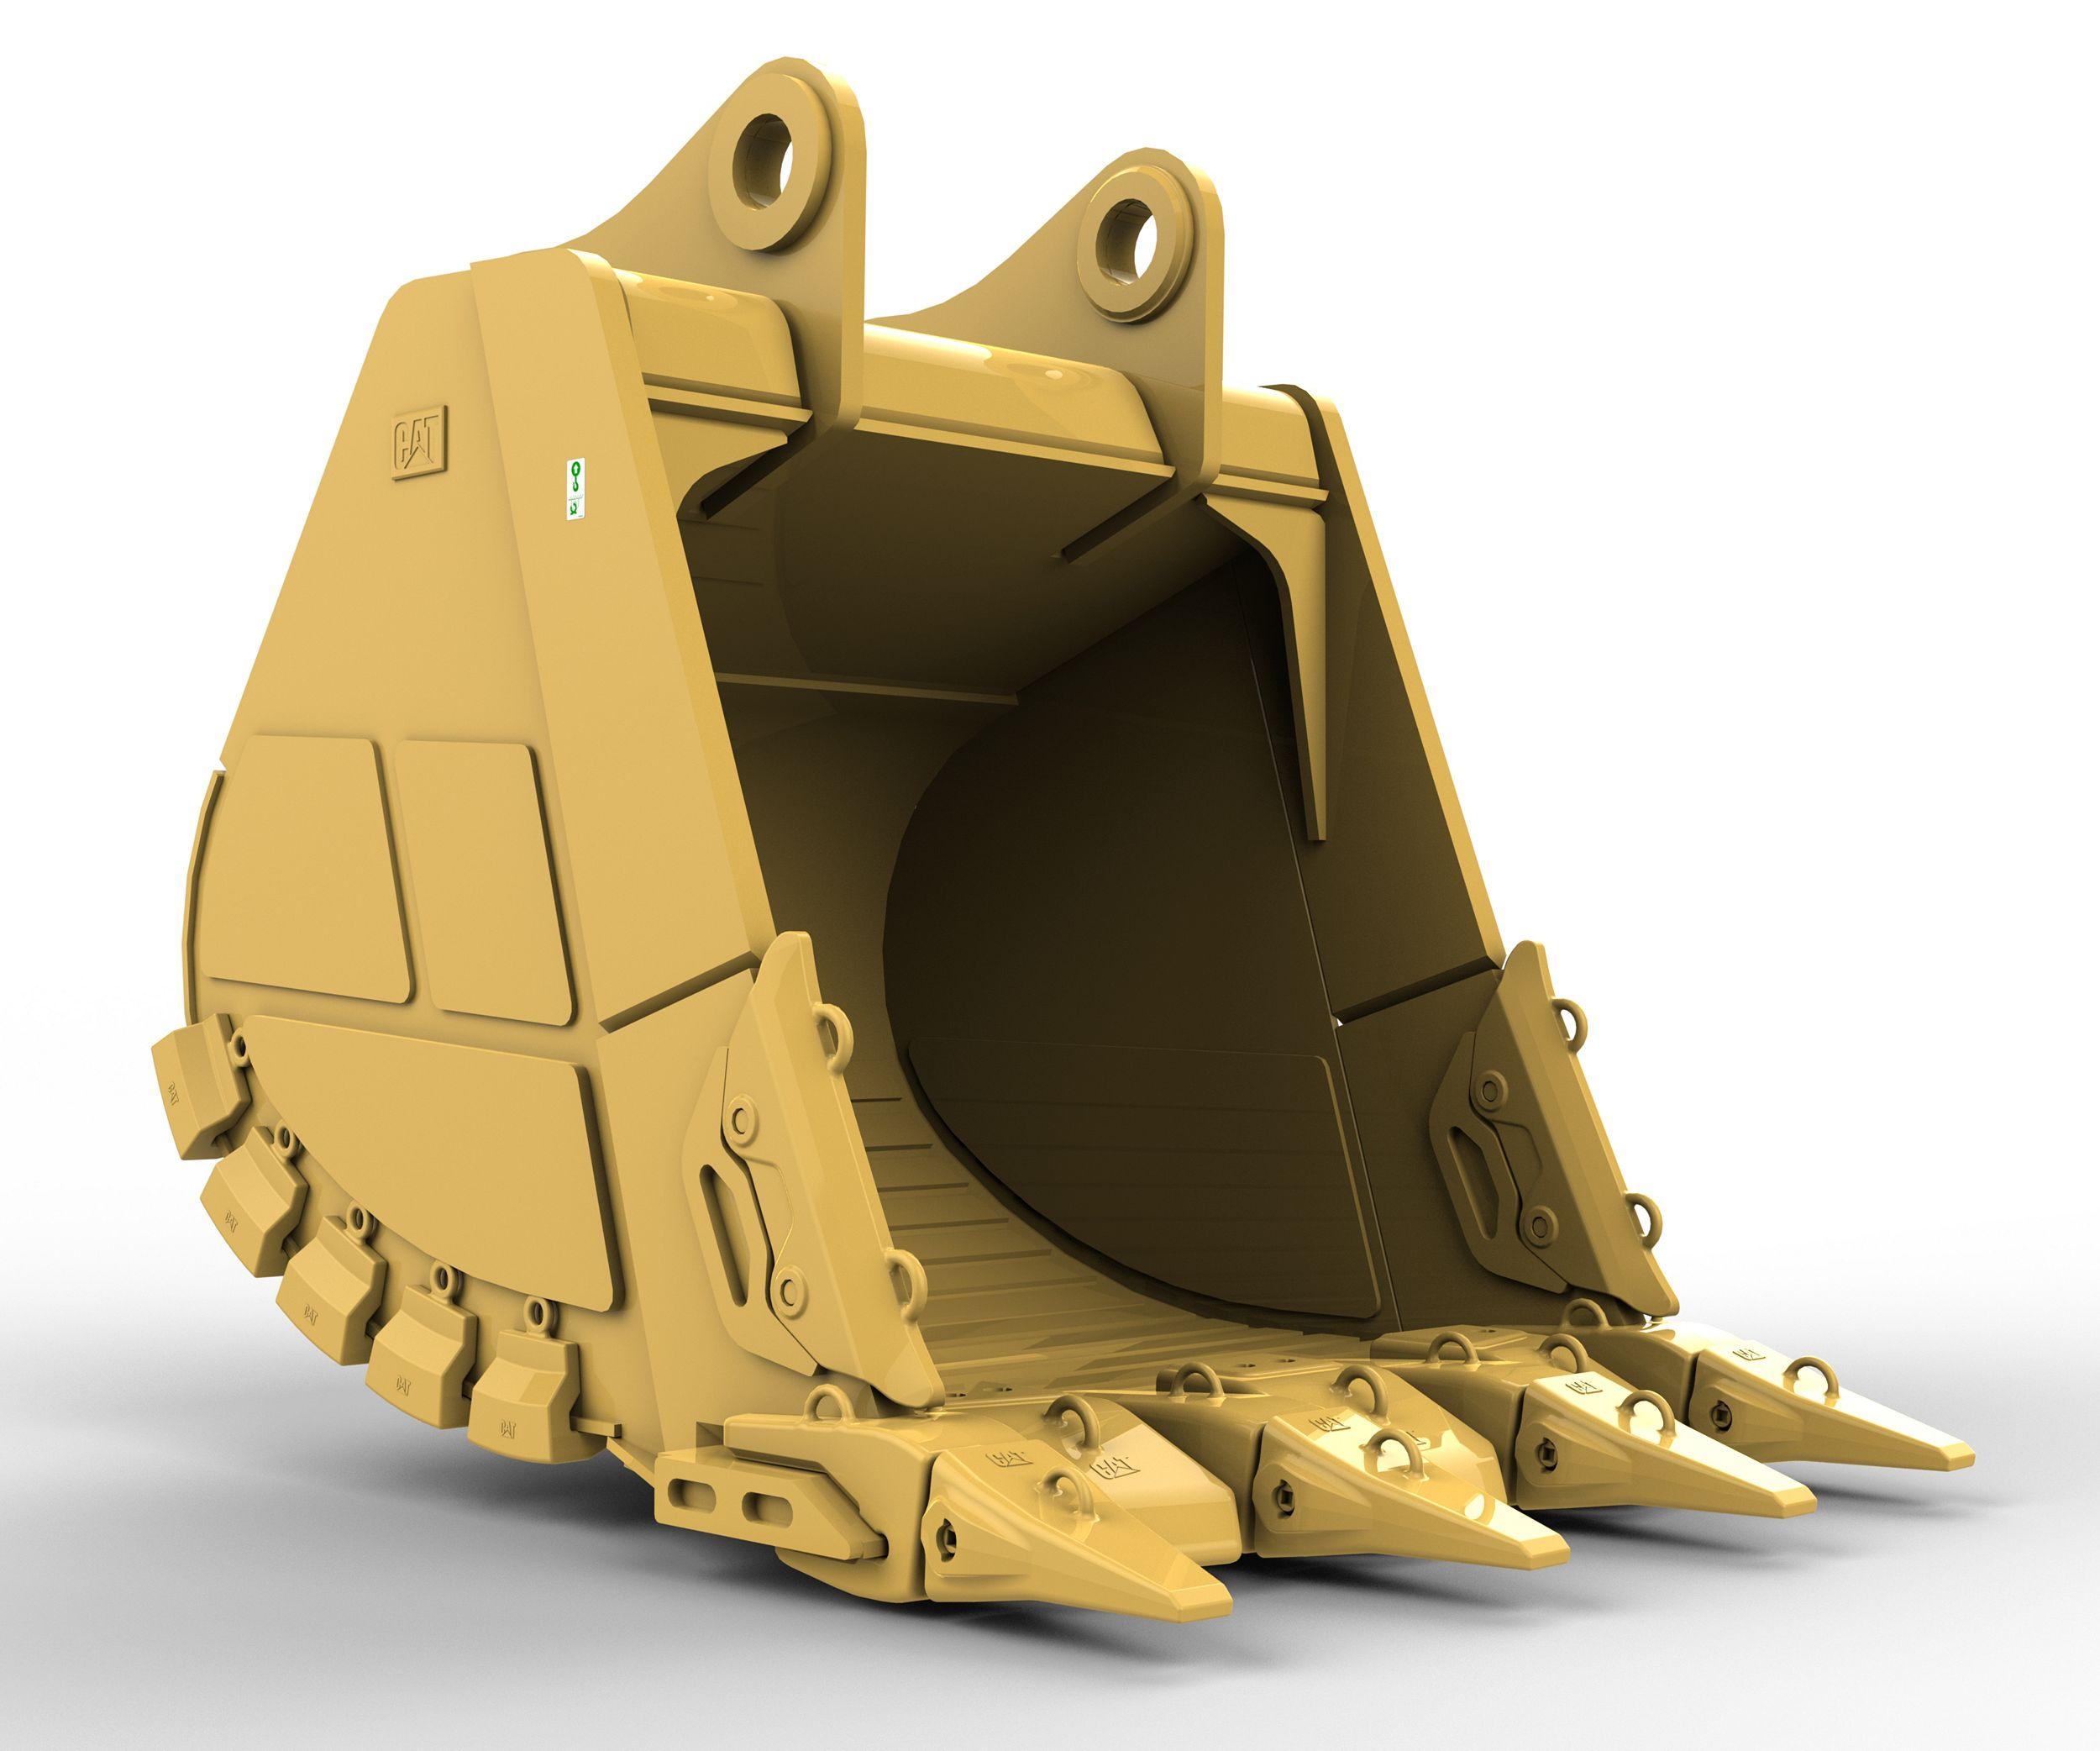 5.8m (7.6)yd Extreme Duty bucket for the 6015B Hyd Mining Shovel